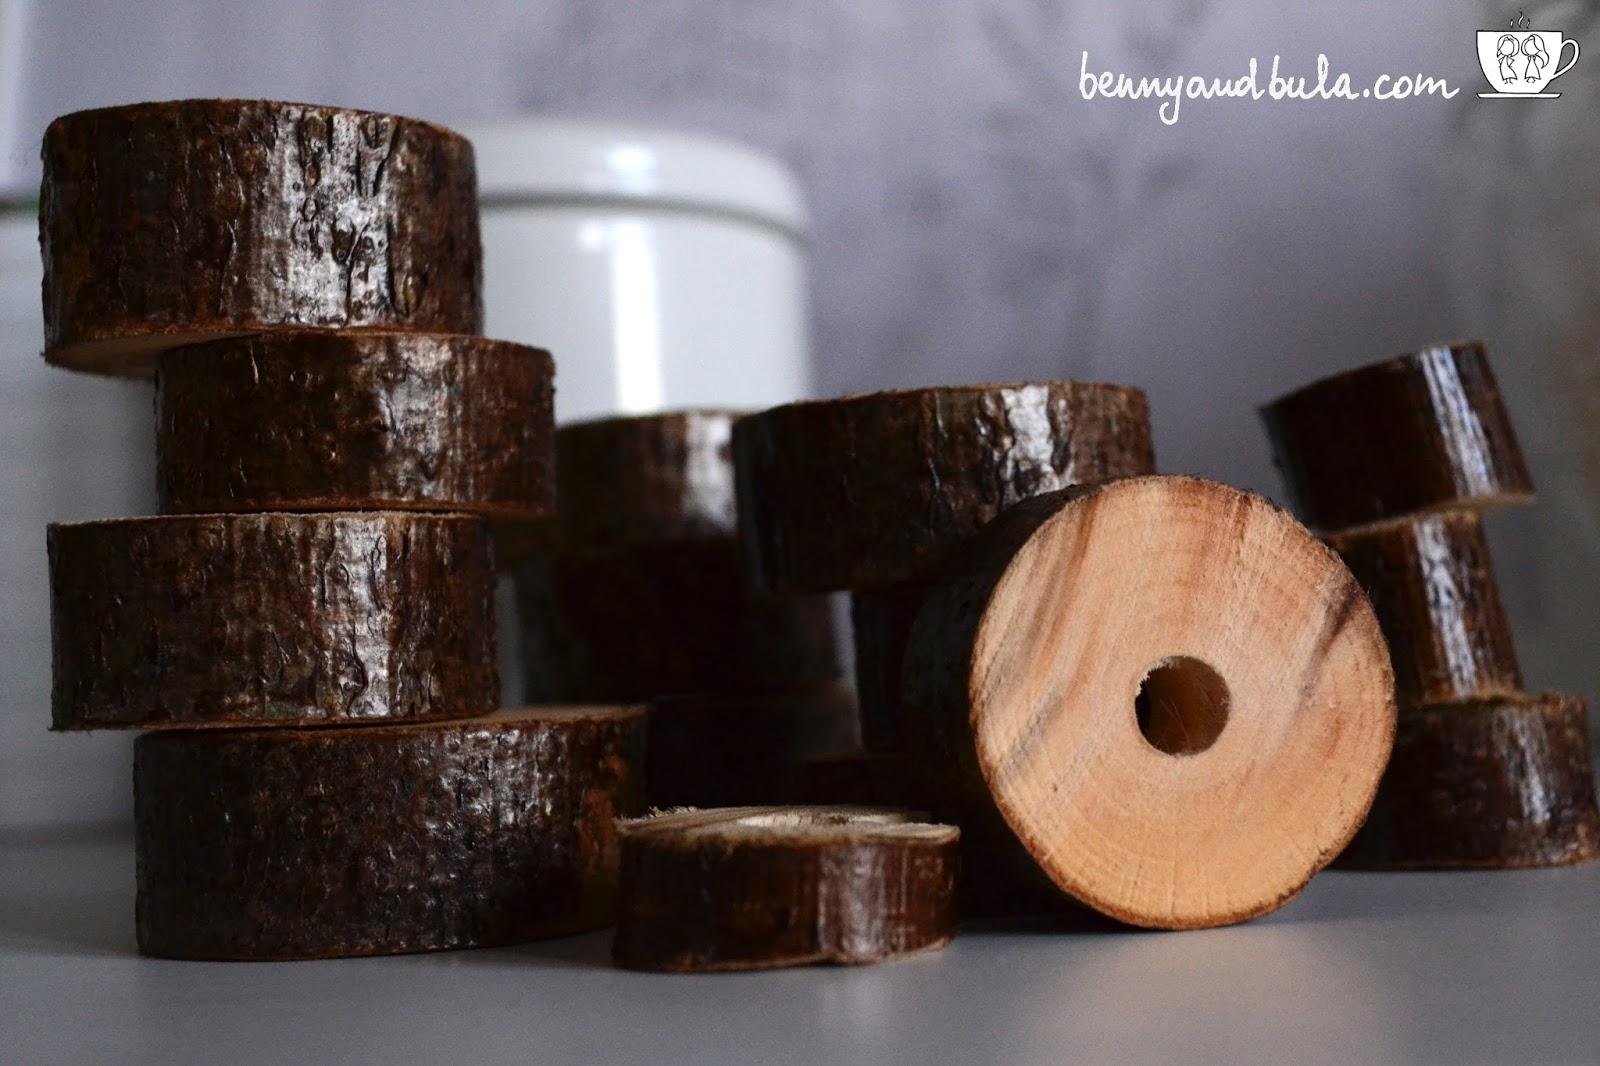 Benny bula 1 natale 2015 albero faidate diy christmas - Rami decorativi legno ...